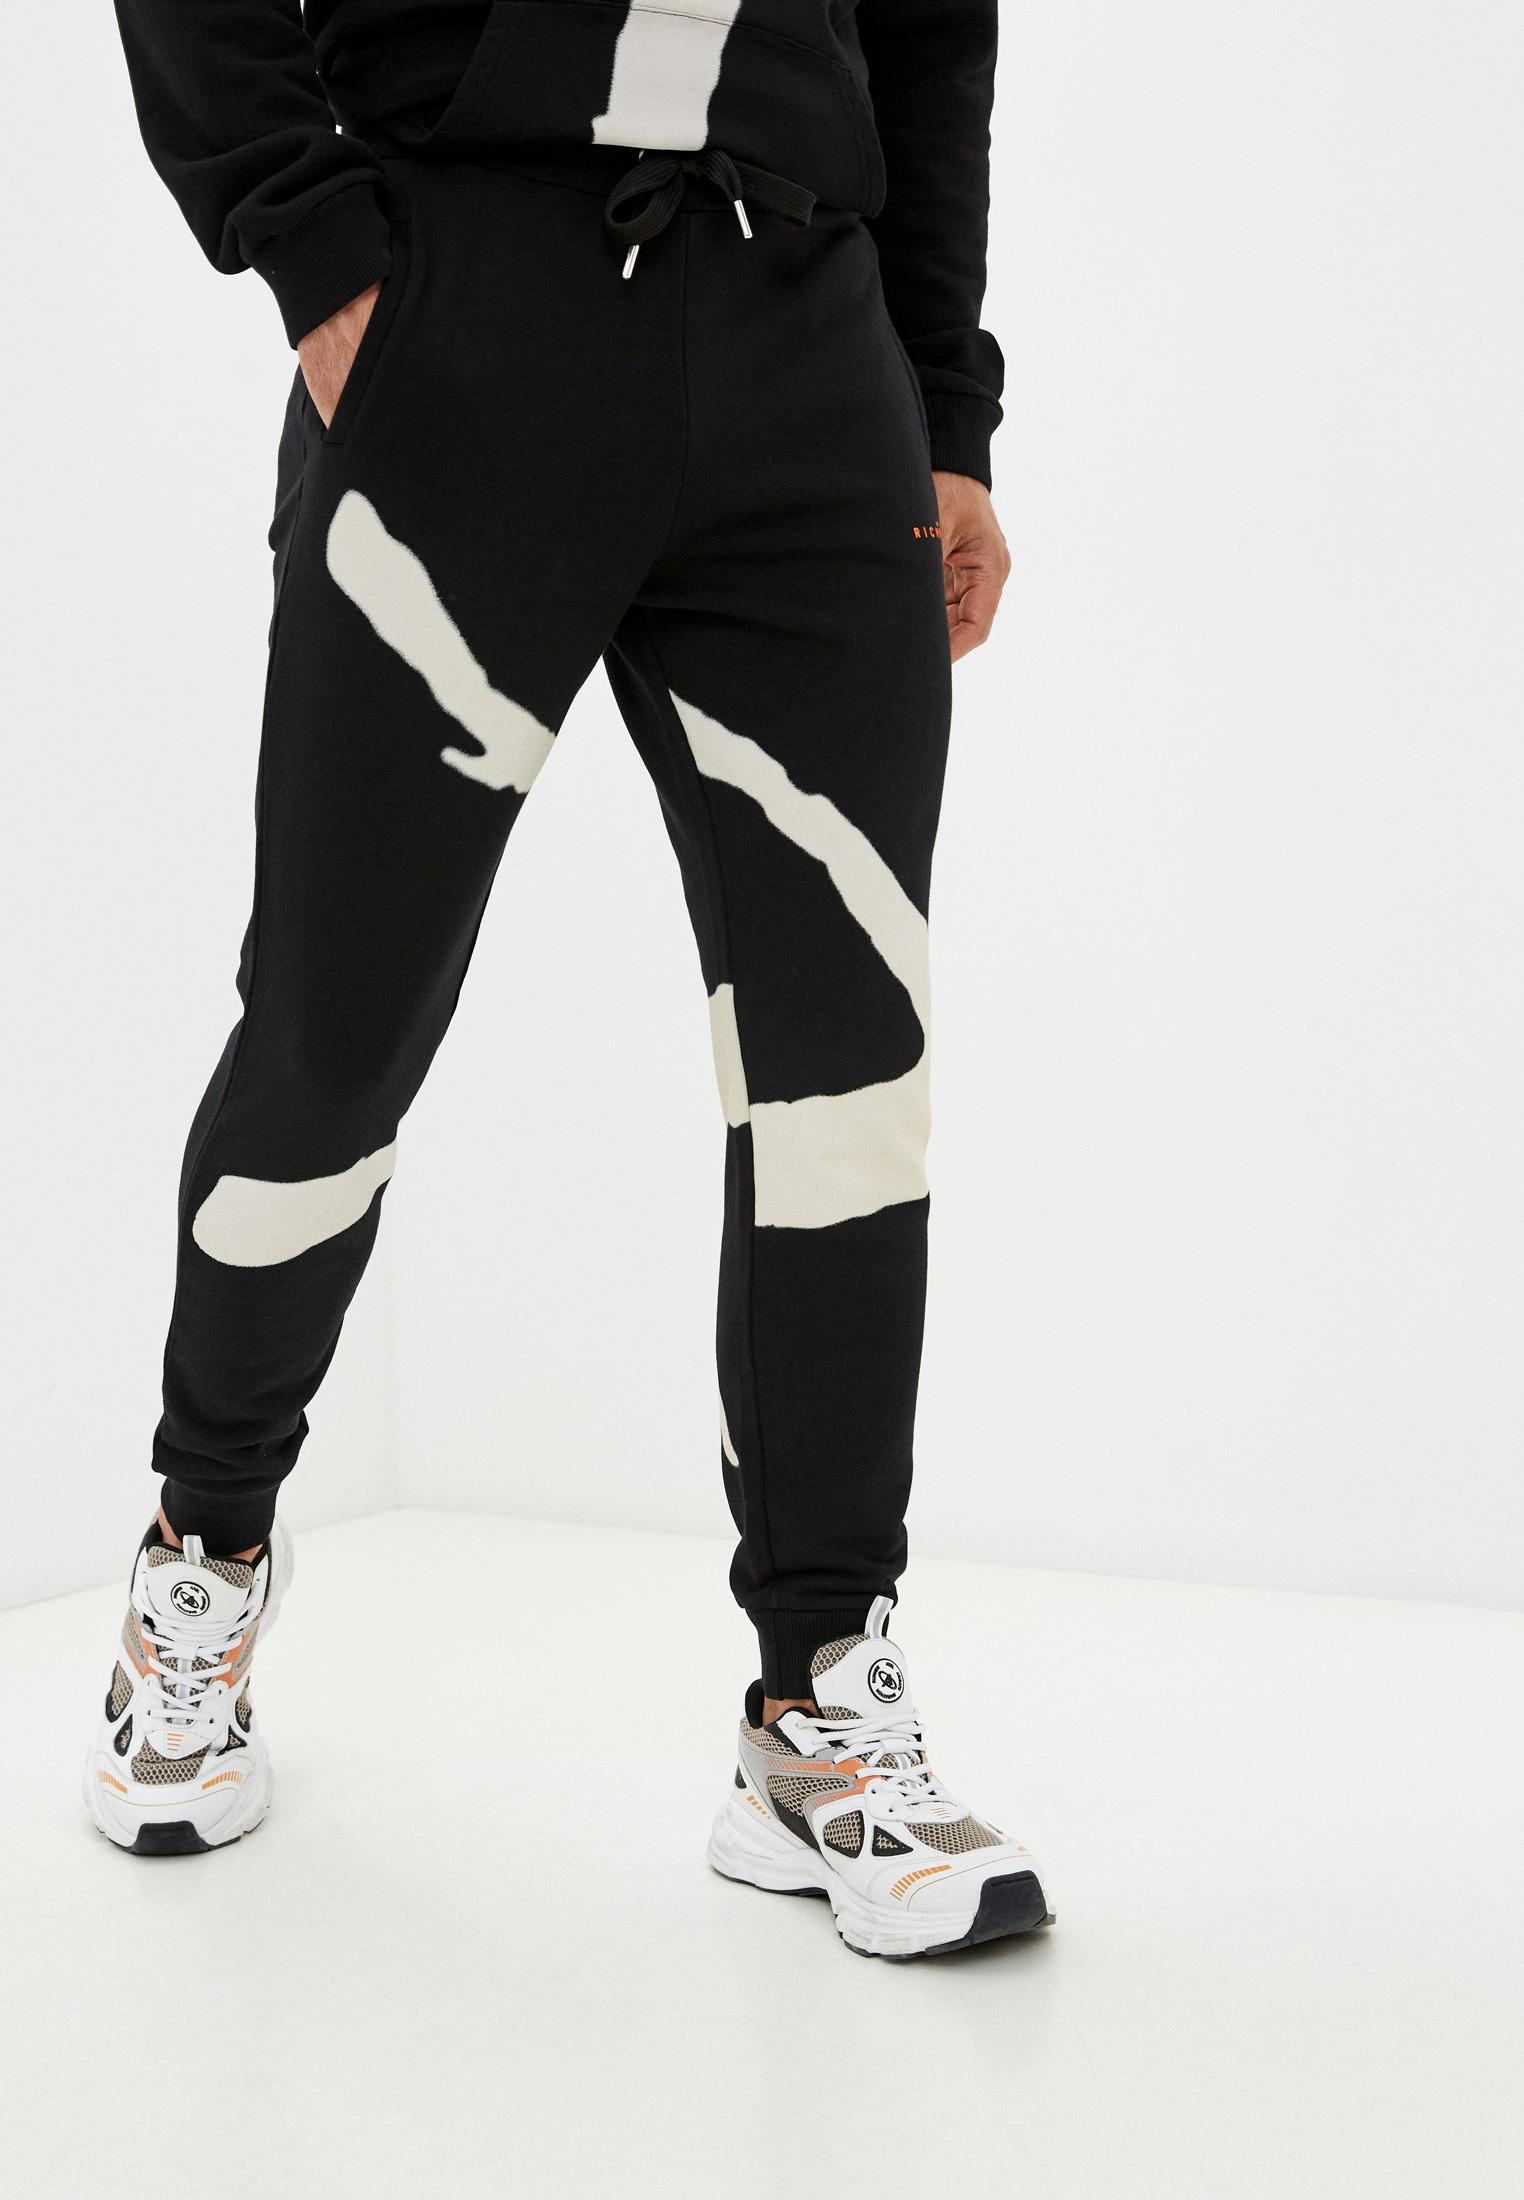 Мужские спортивные брюки John Richmond (Джон Ричмонд) Брюки спортивные John Richmond